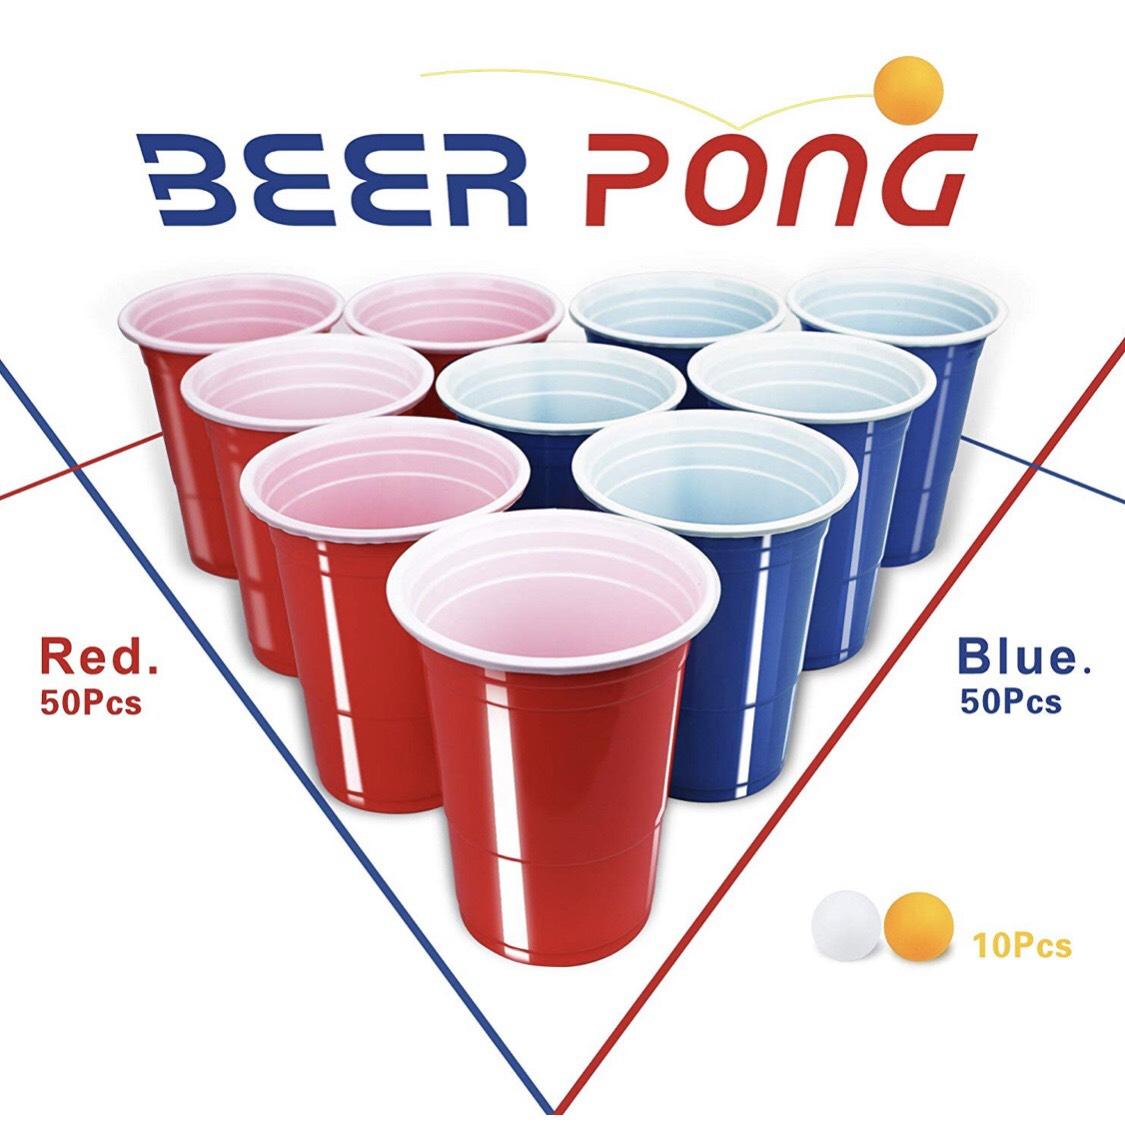 100x Beer Pong Becher + 10 Bälle